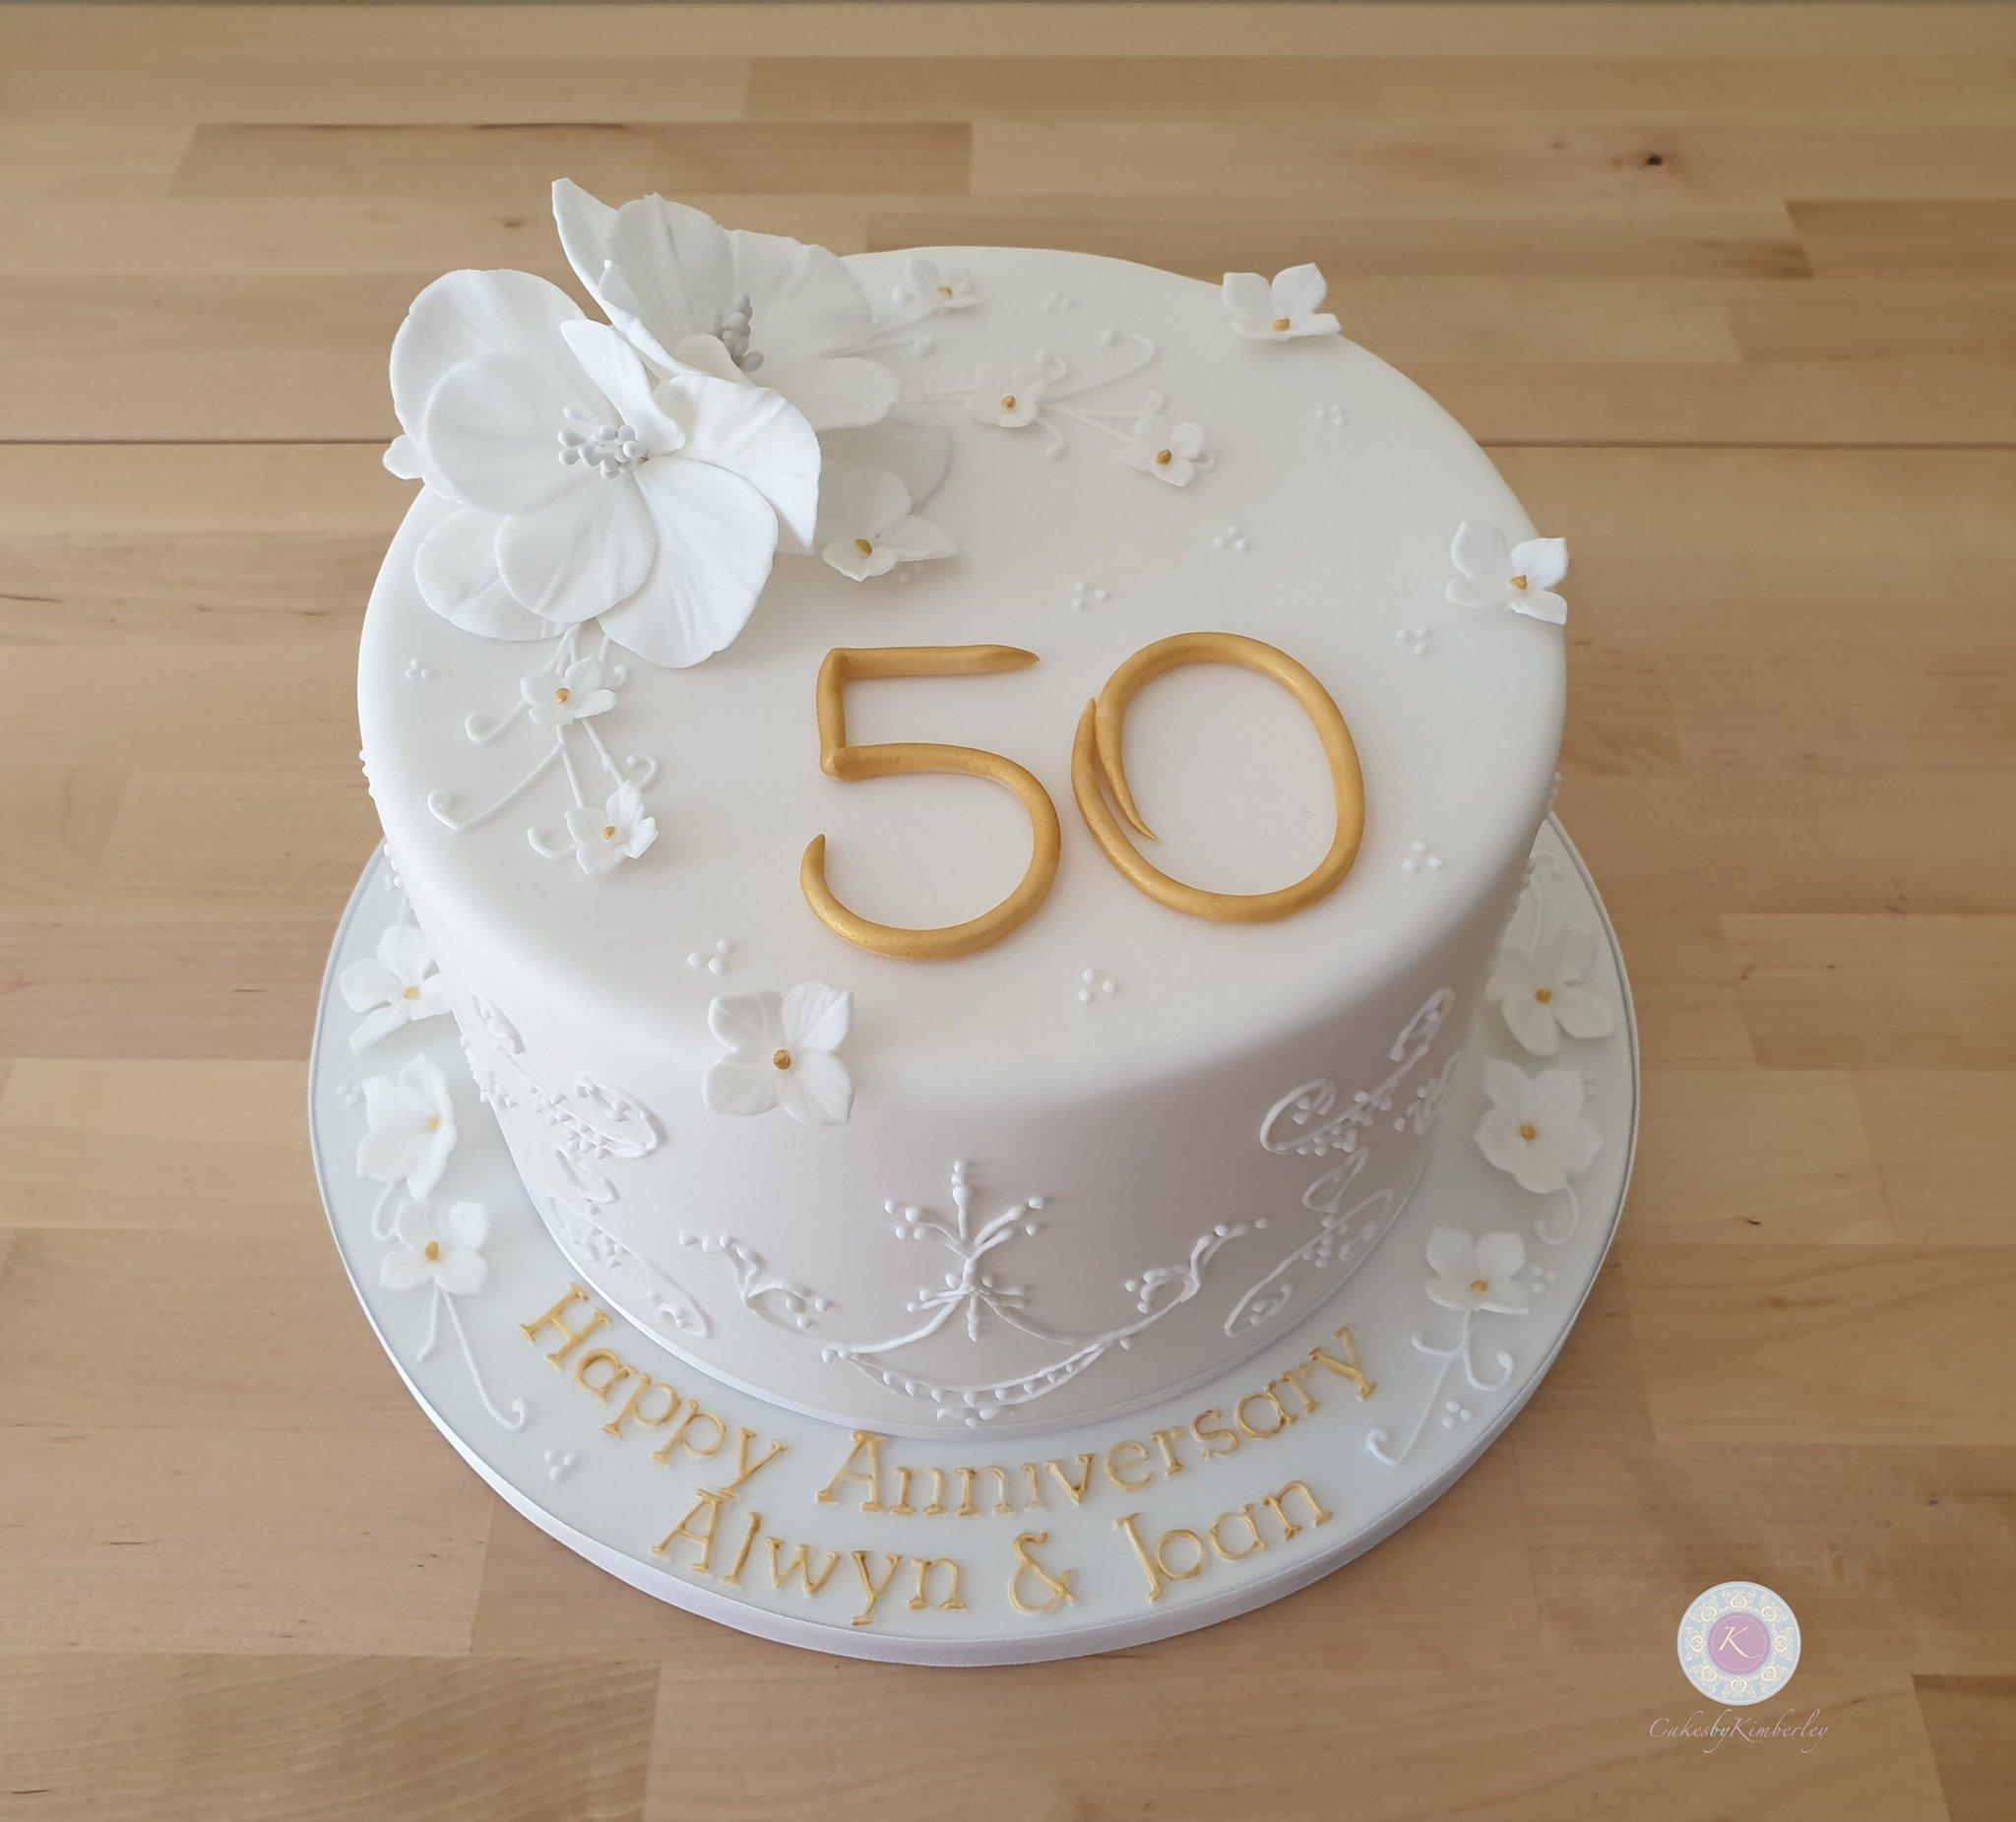 Alwyn Joan 50th